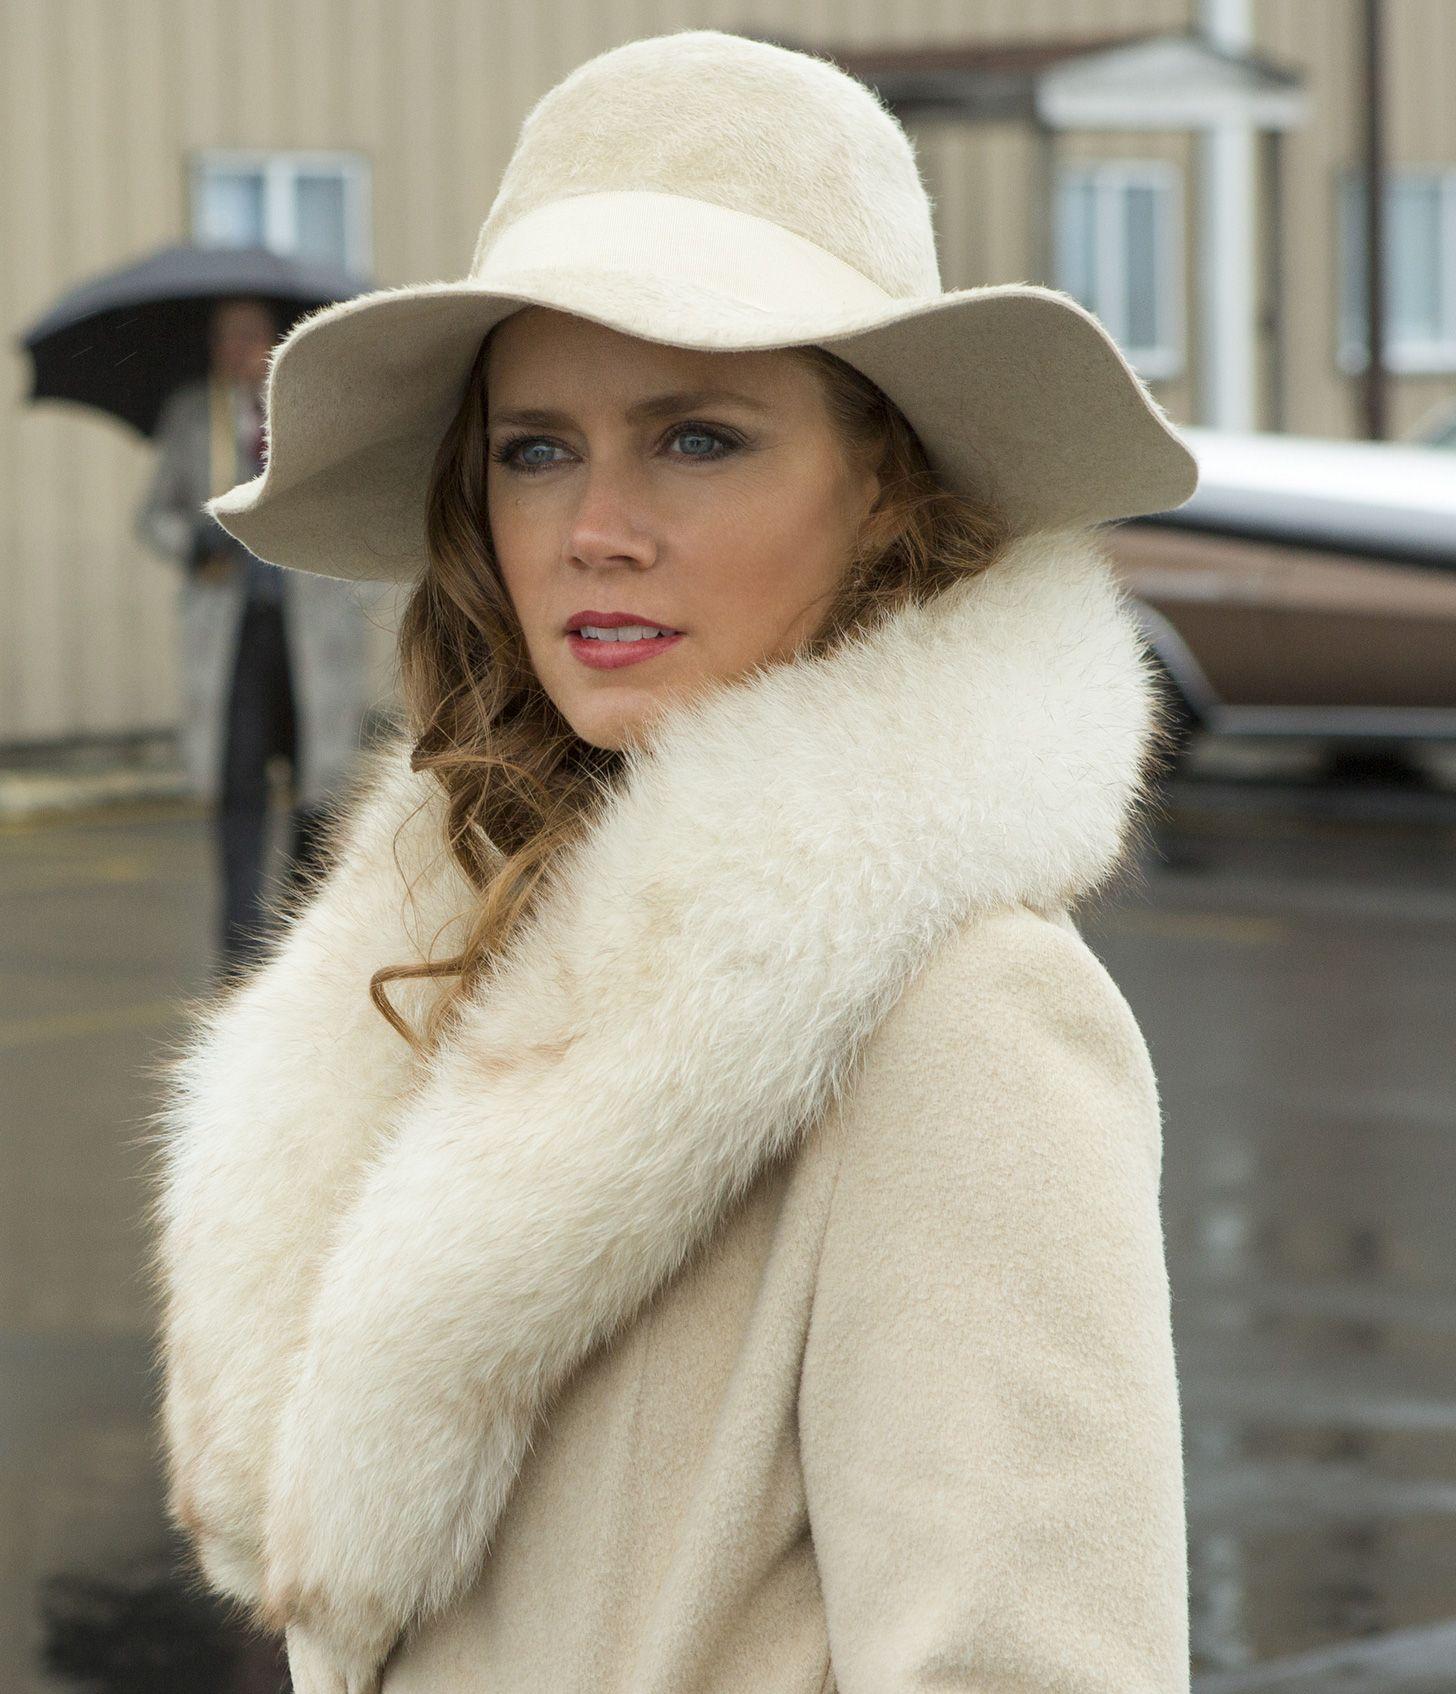 American Hustle inspiration - white fur, white coat, white hat